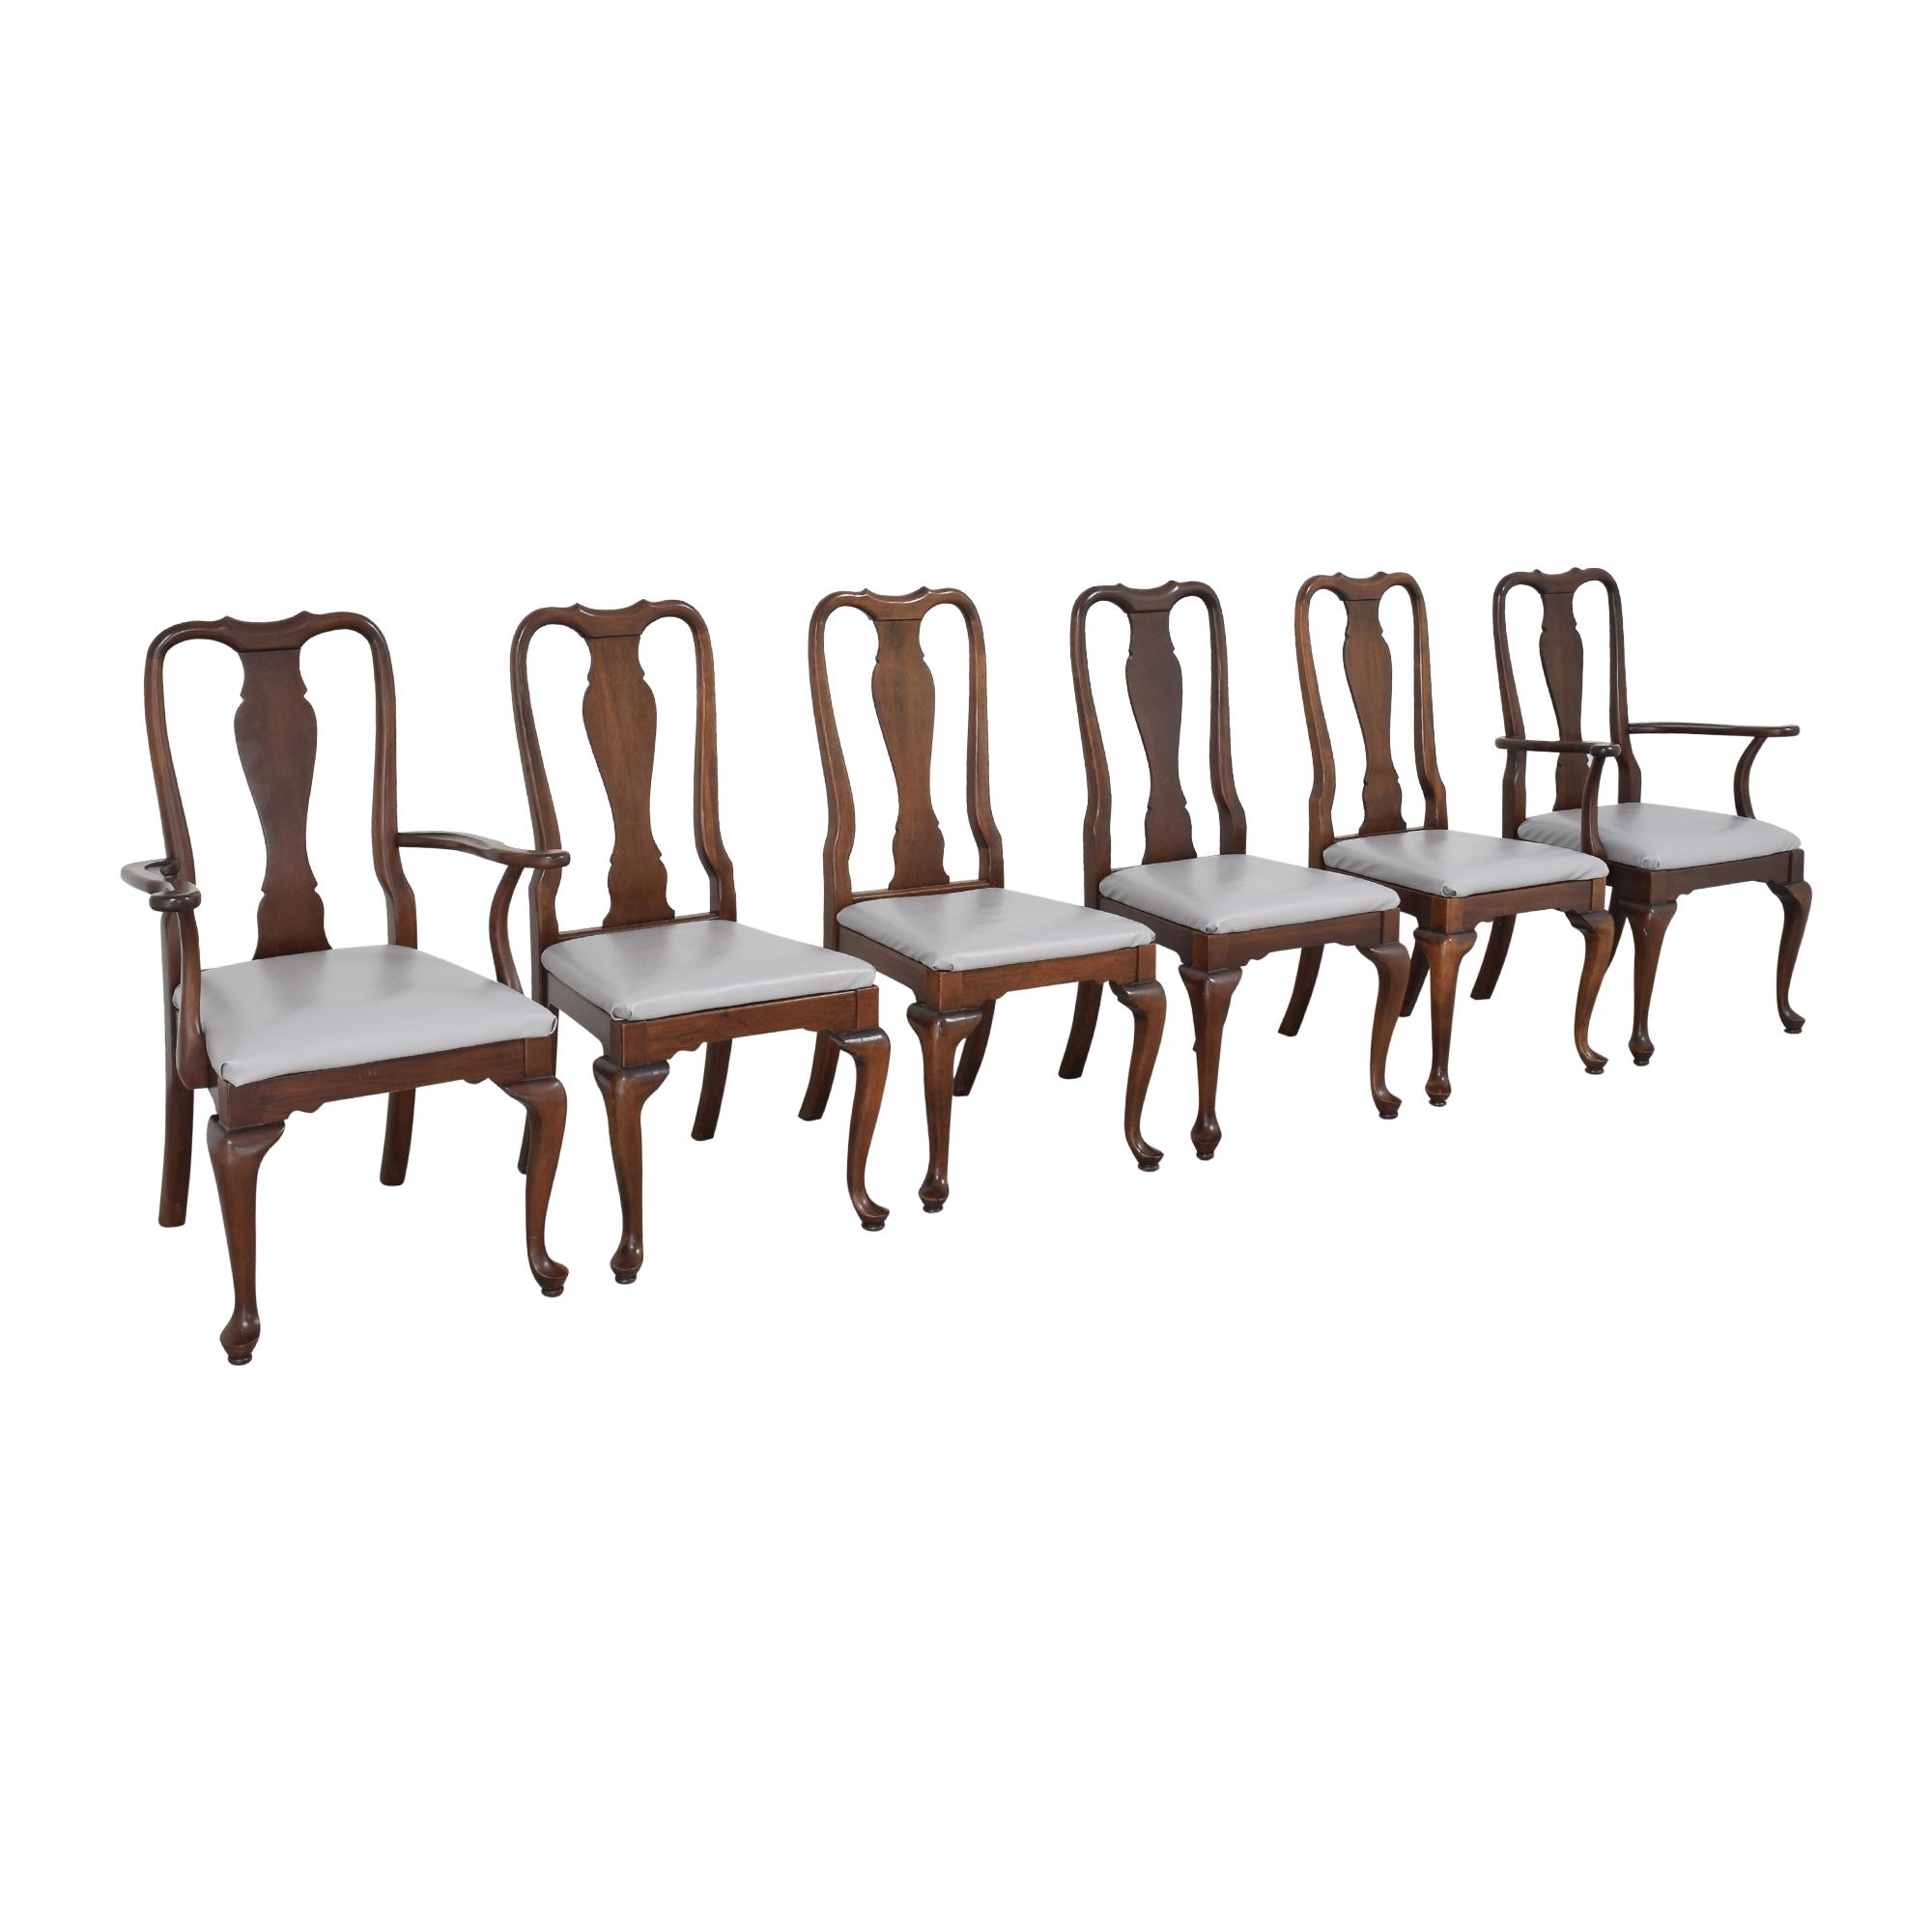 Ethan Allen Ethan Allen Georgian Court Dining Chairs on sale